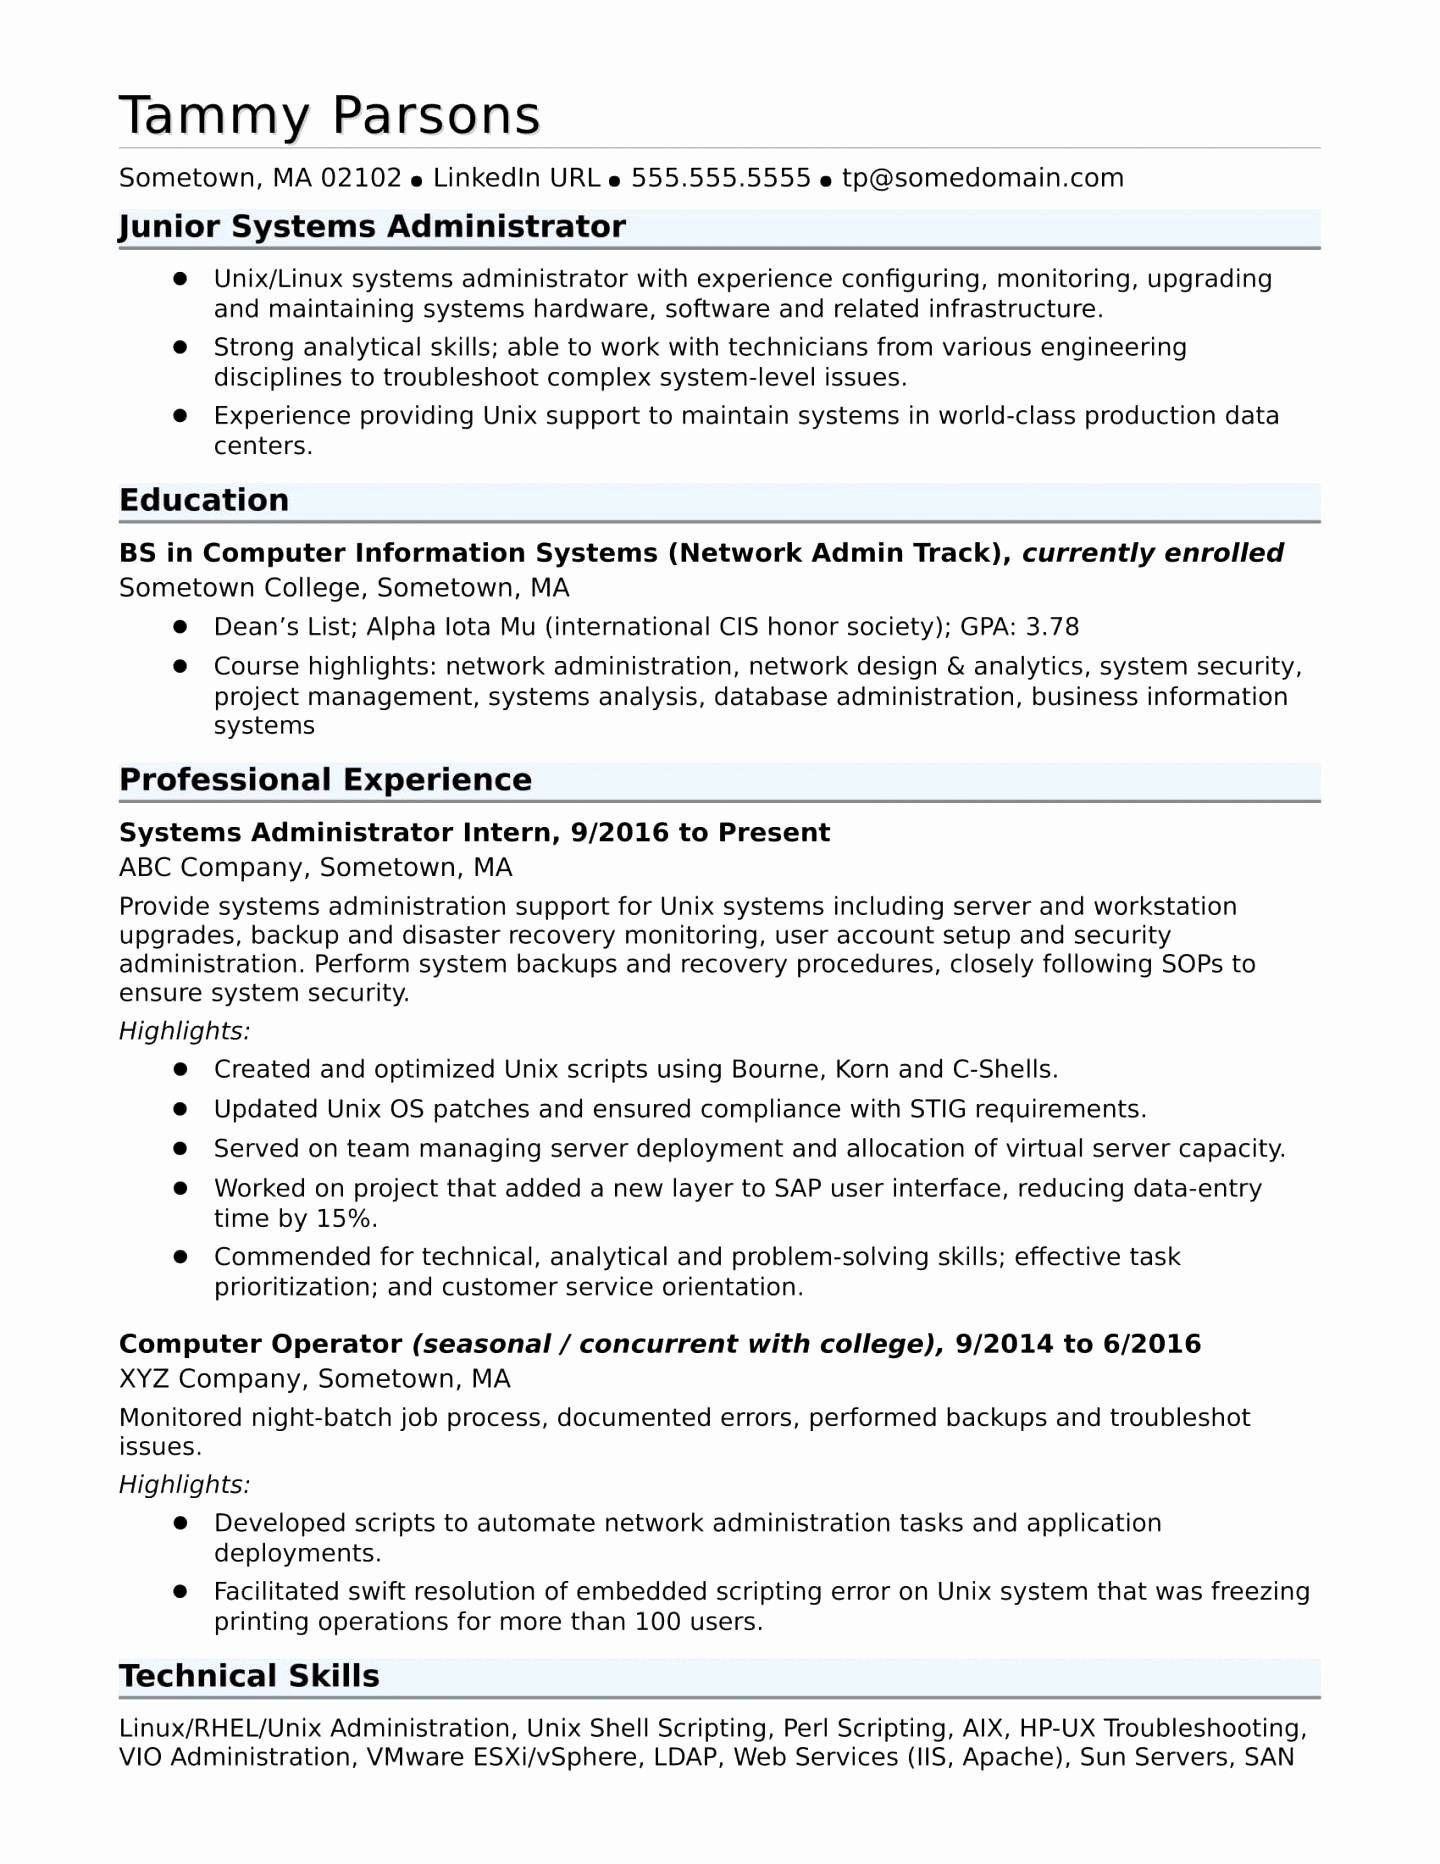 Administrative Skills For Resume Inspirational Best Network Administrator Skills Resume Resume Skills Job Resume Examples Resume Examples